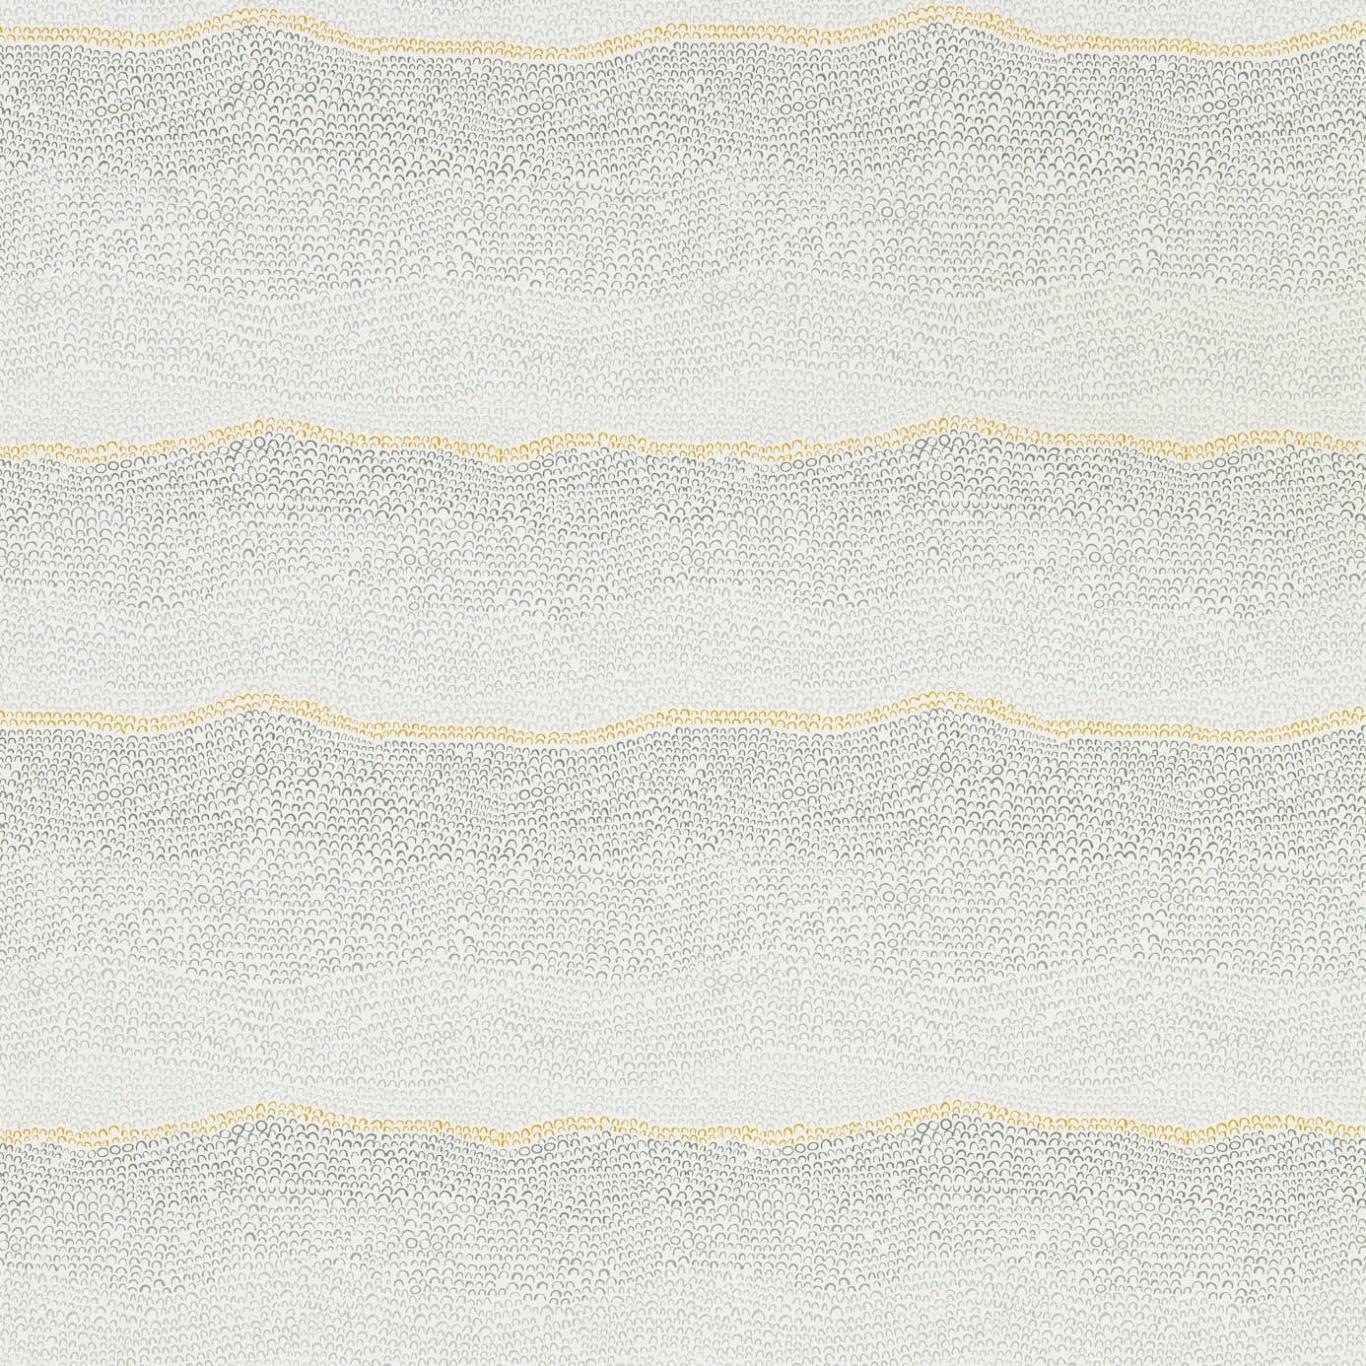 Image of Sanderson Home Ripley Ochre/Slate Wallpaper 216584